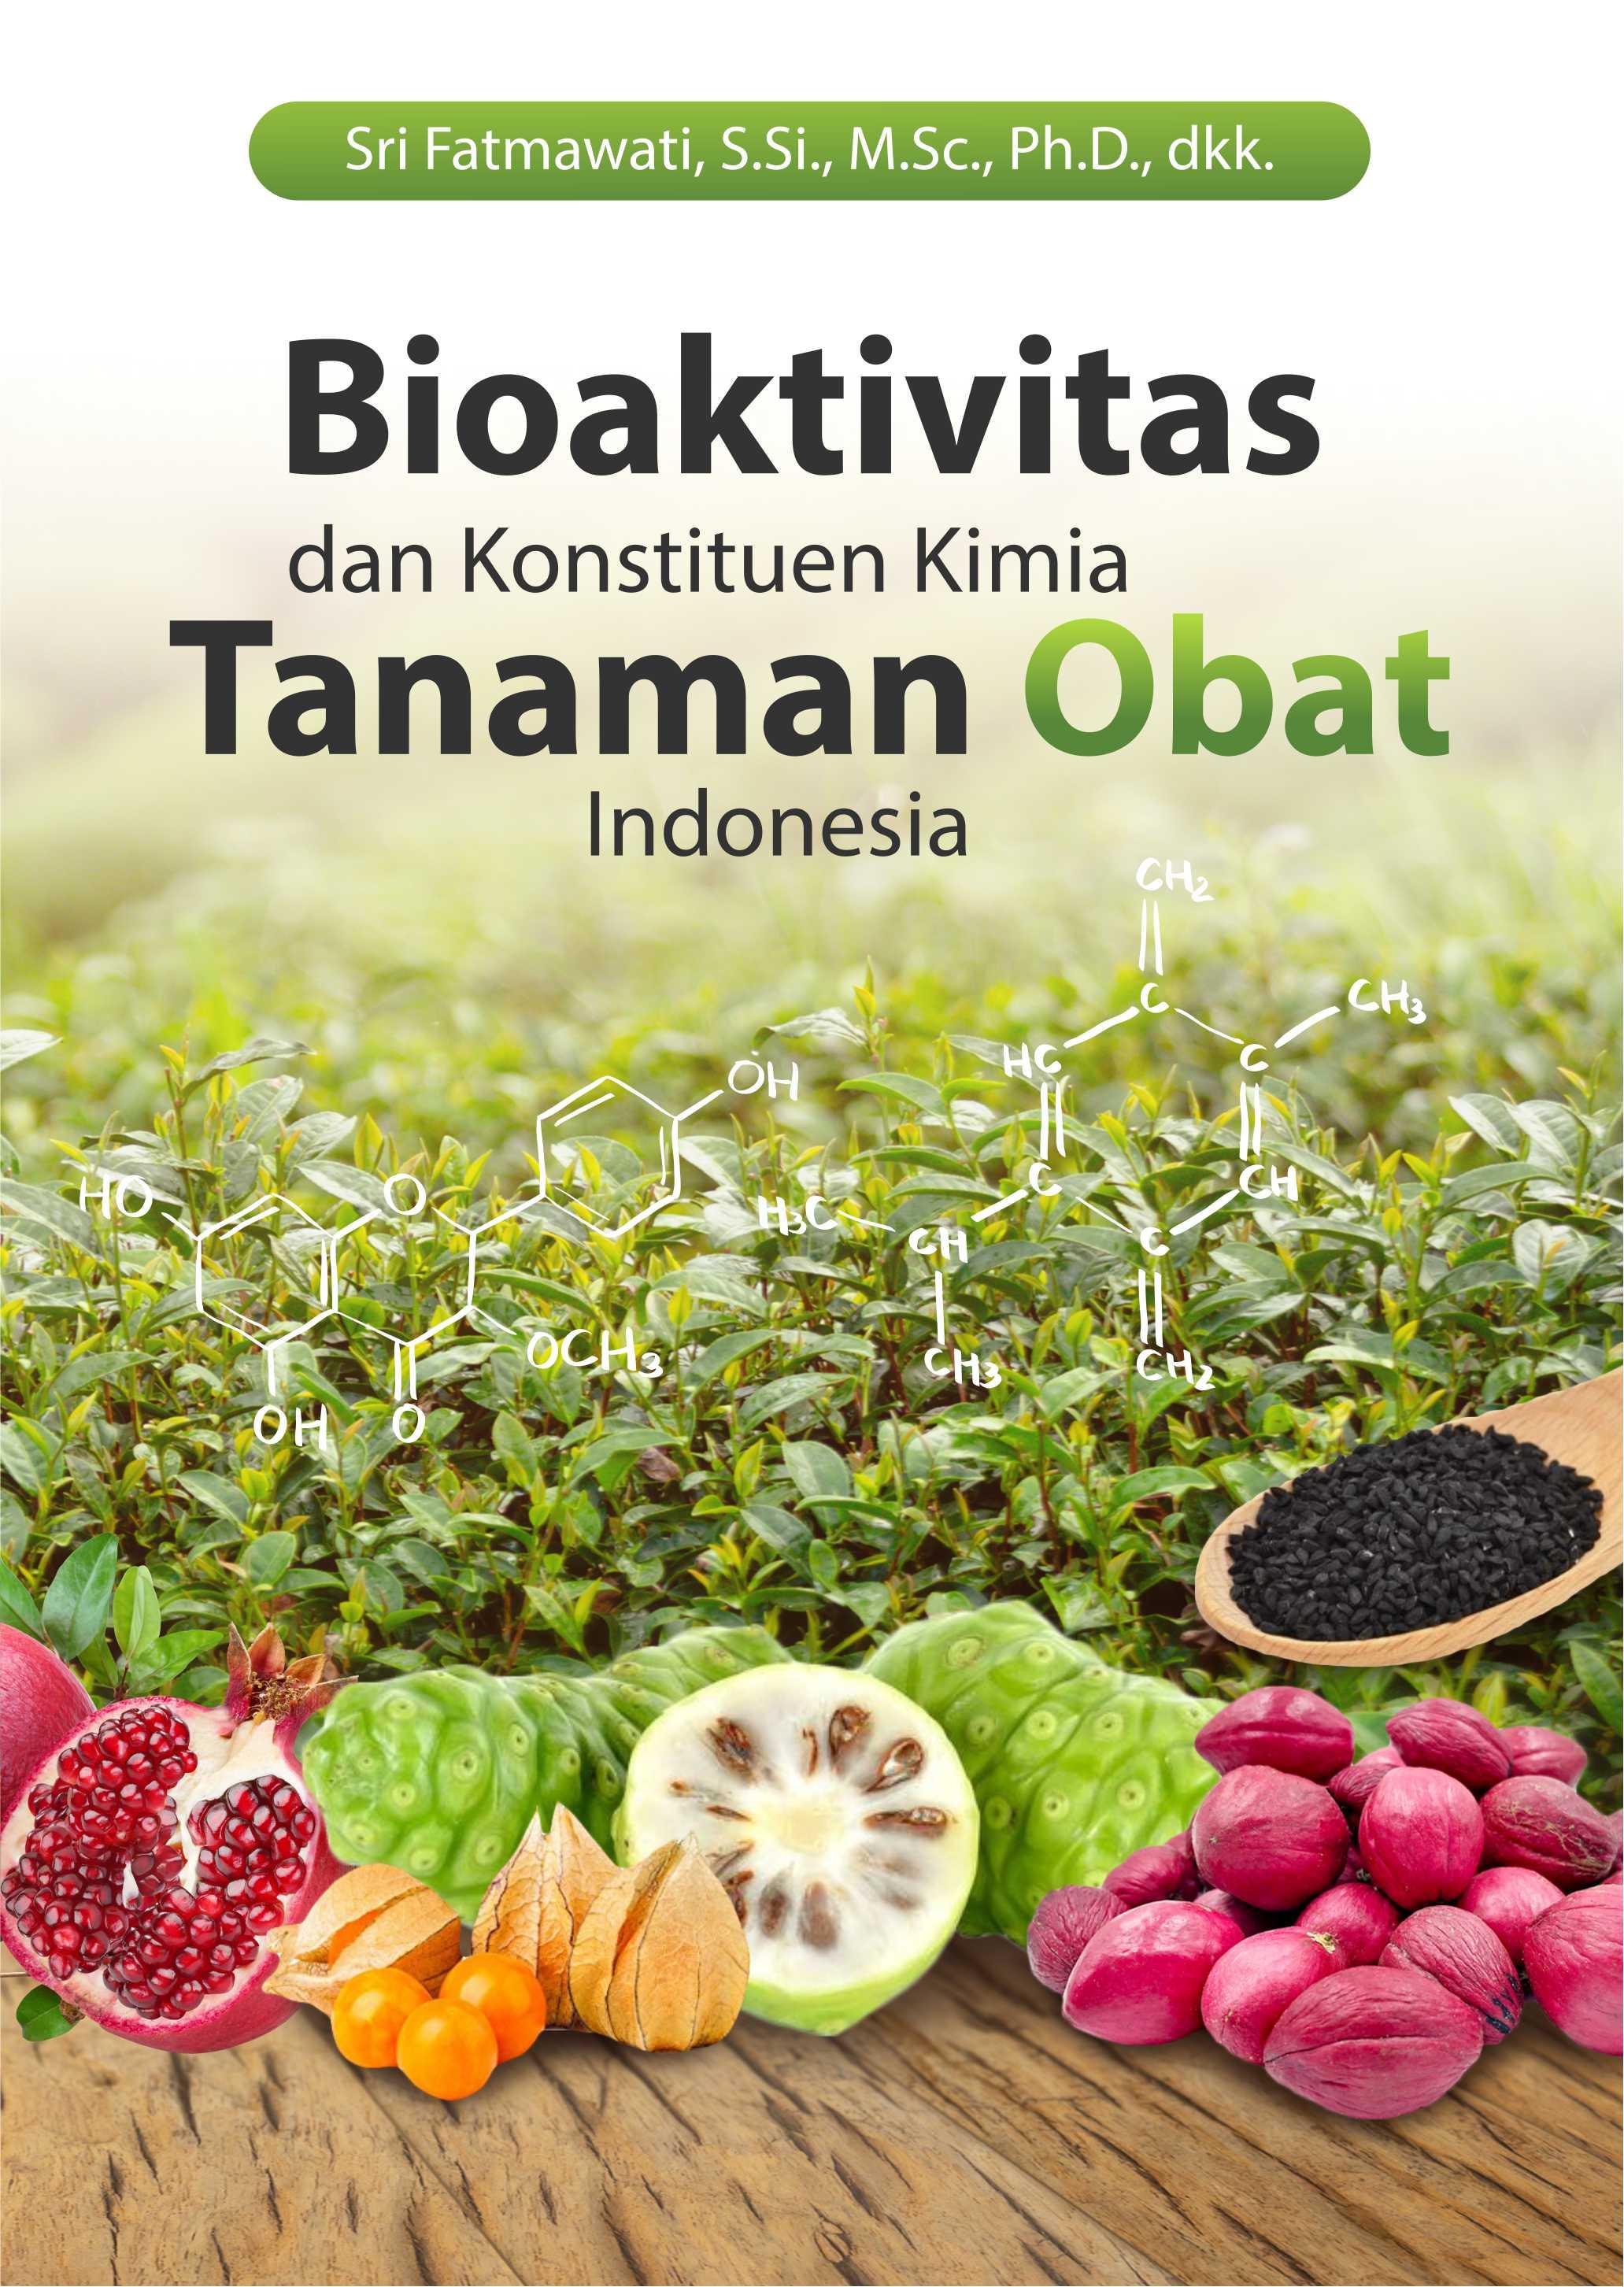 Bioaktivitas dan konstituen kimia tanaman obat Indonesia [sumber elektronis]